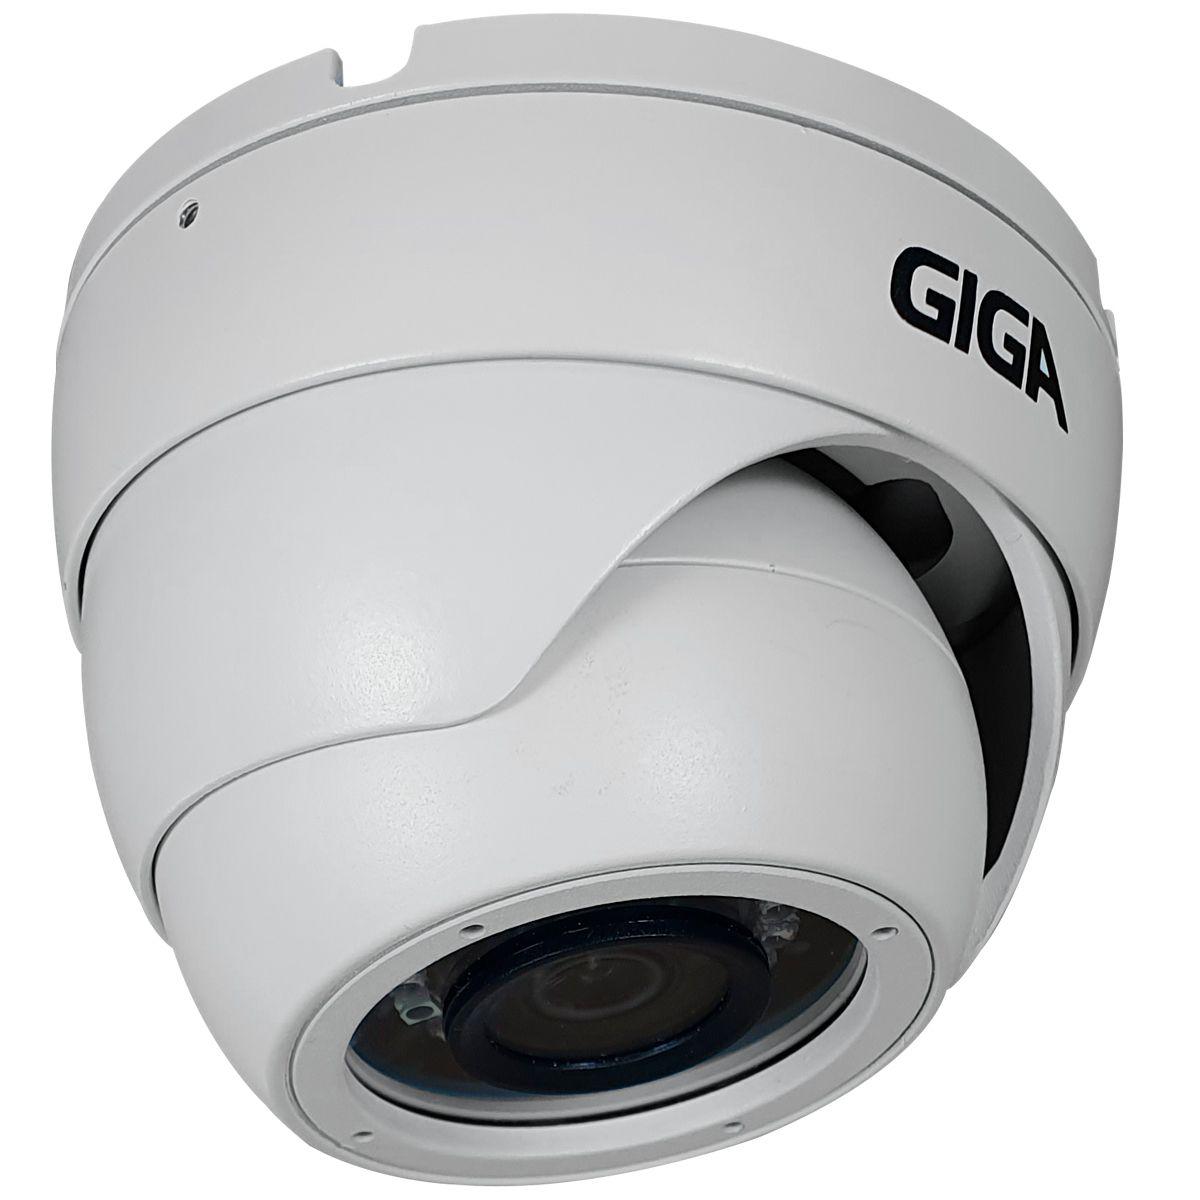 Kit HD 720p 08 Câmeras GS0021 + DVR Giga Security + HD 1TB Skygawk + Acessórios  - Tudo Forte